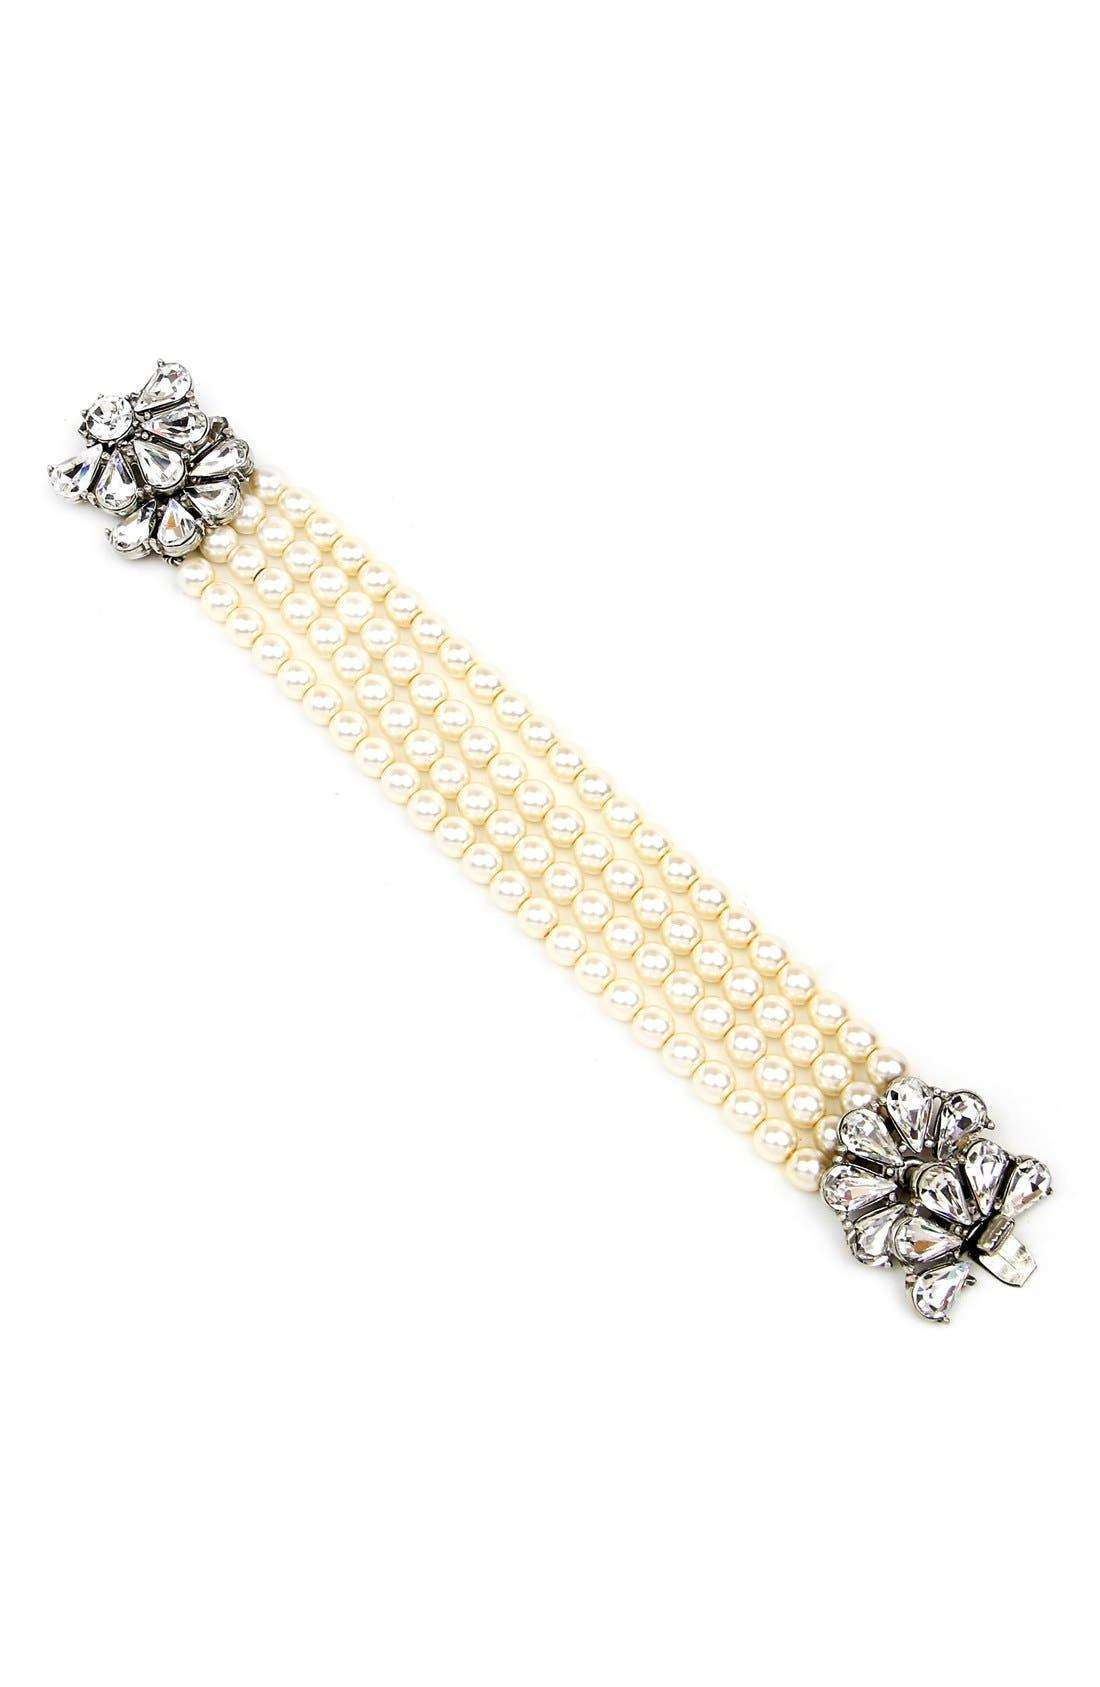 Crystal & Faux Pearl Strand Bracelet,                             Main thumbnail 1, color,                             900